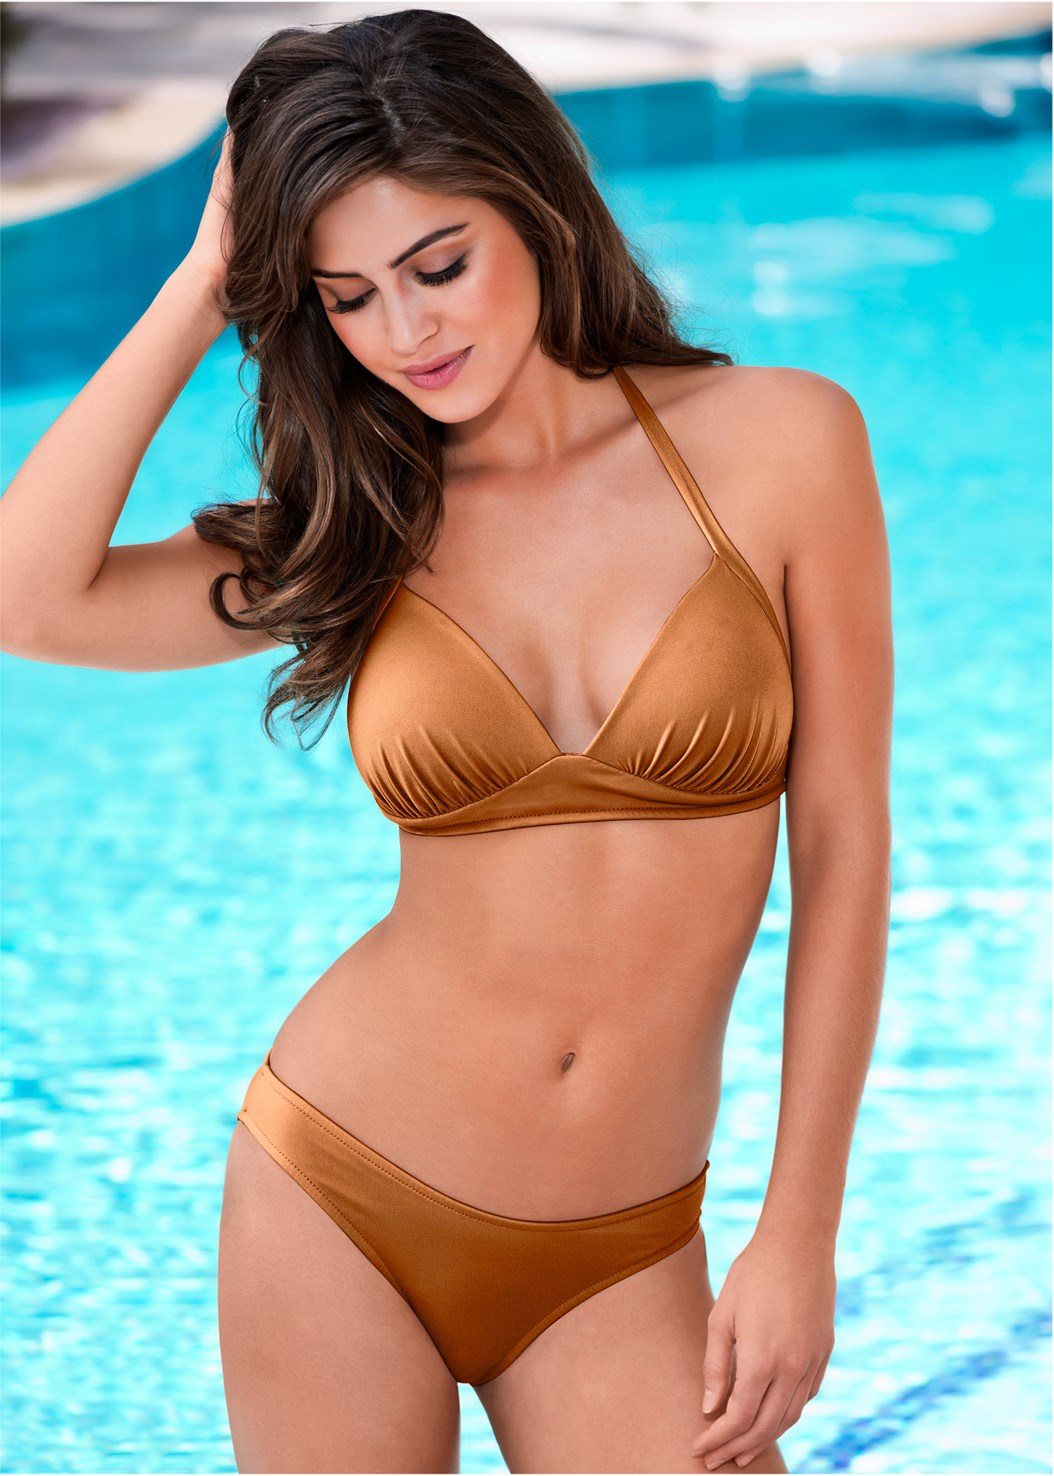 Perfection Push Up Halter,Scoop Front Classic Bikini Bottom